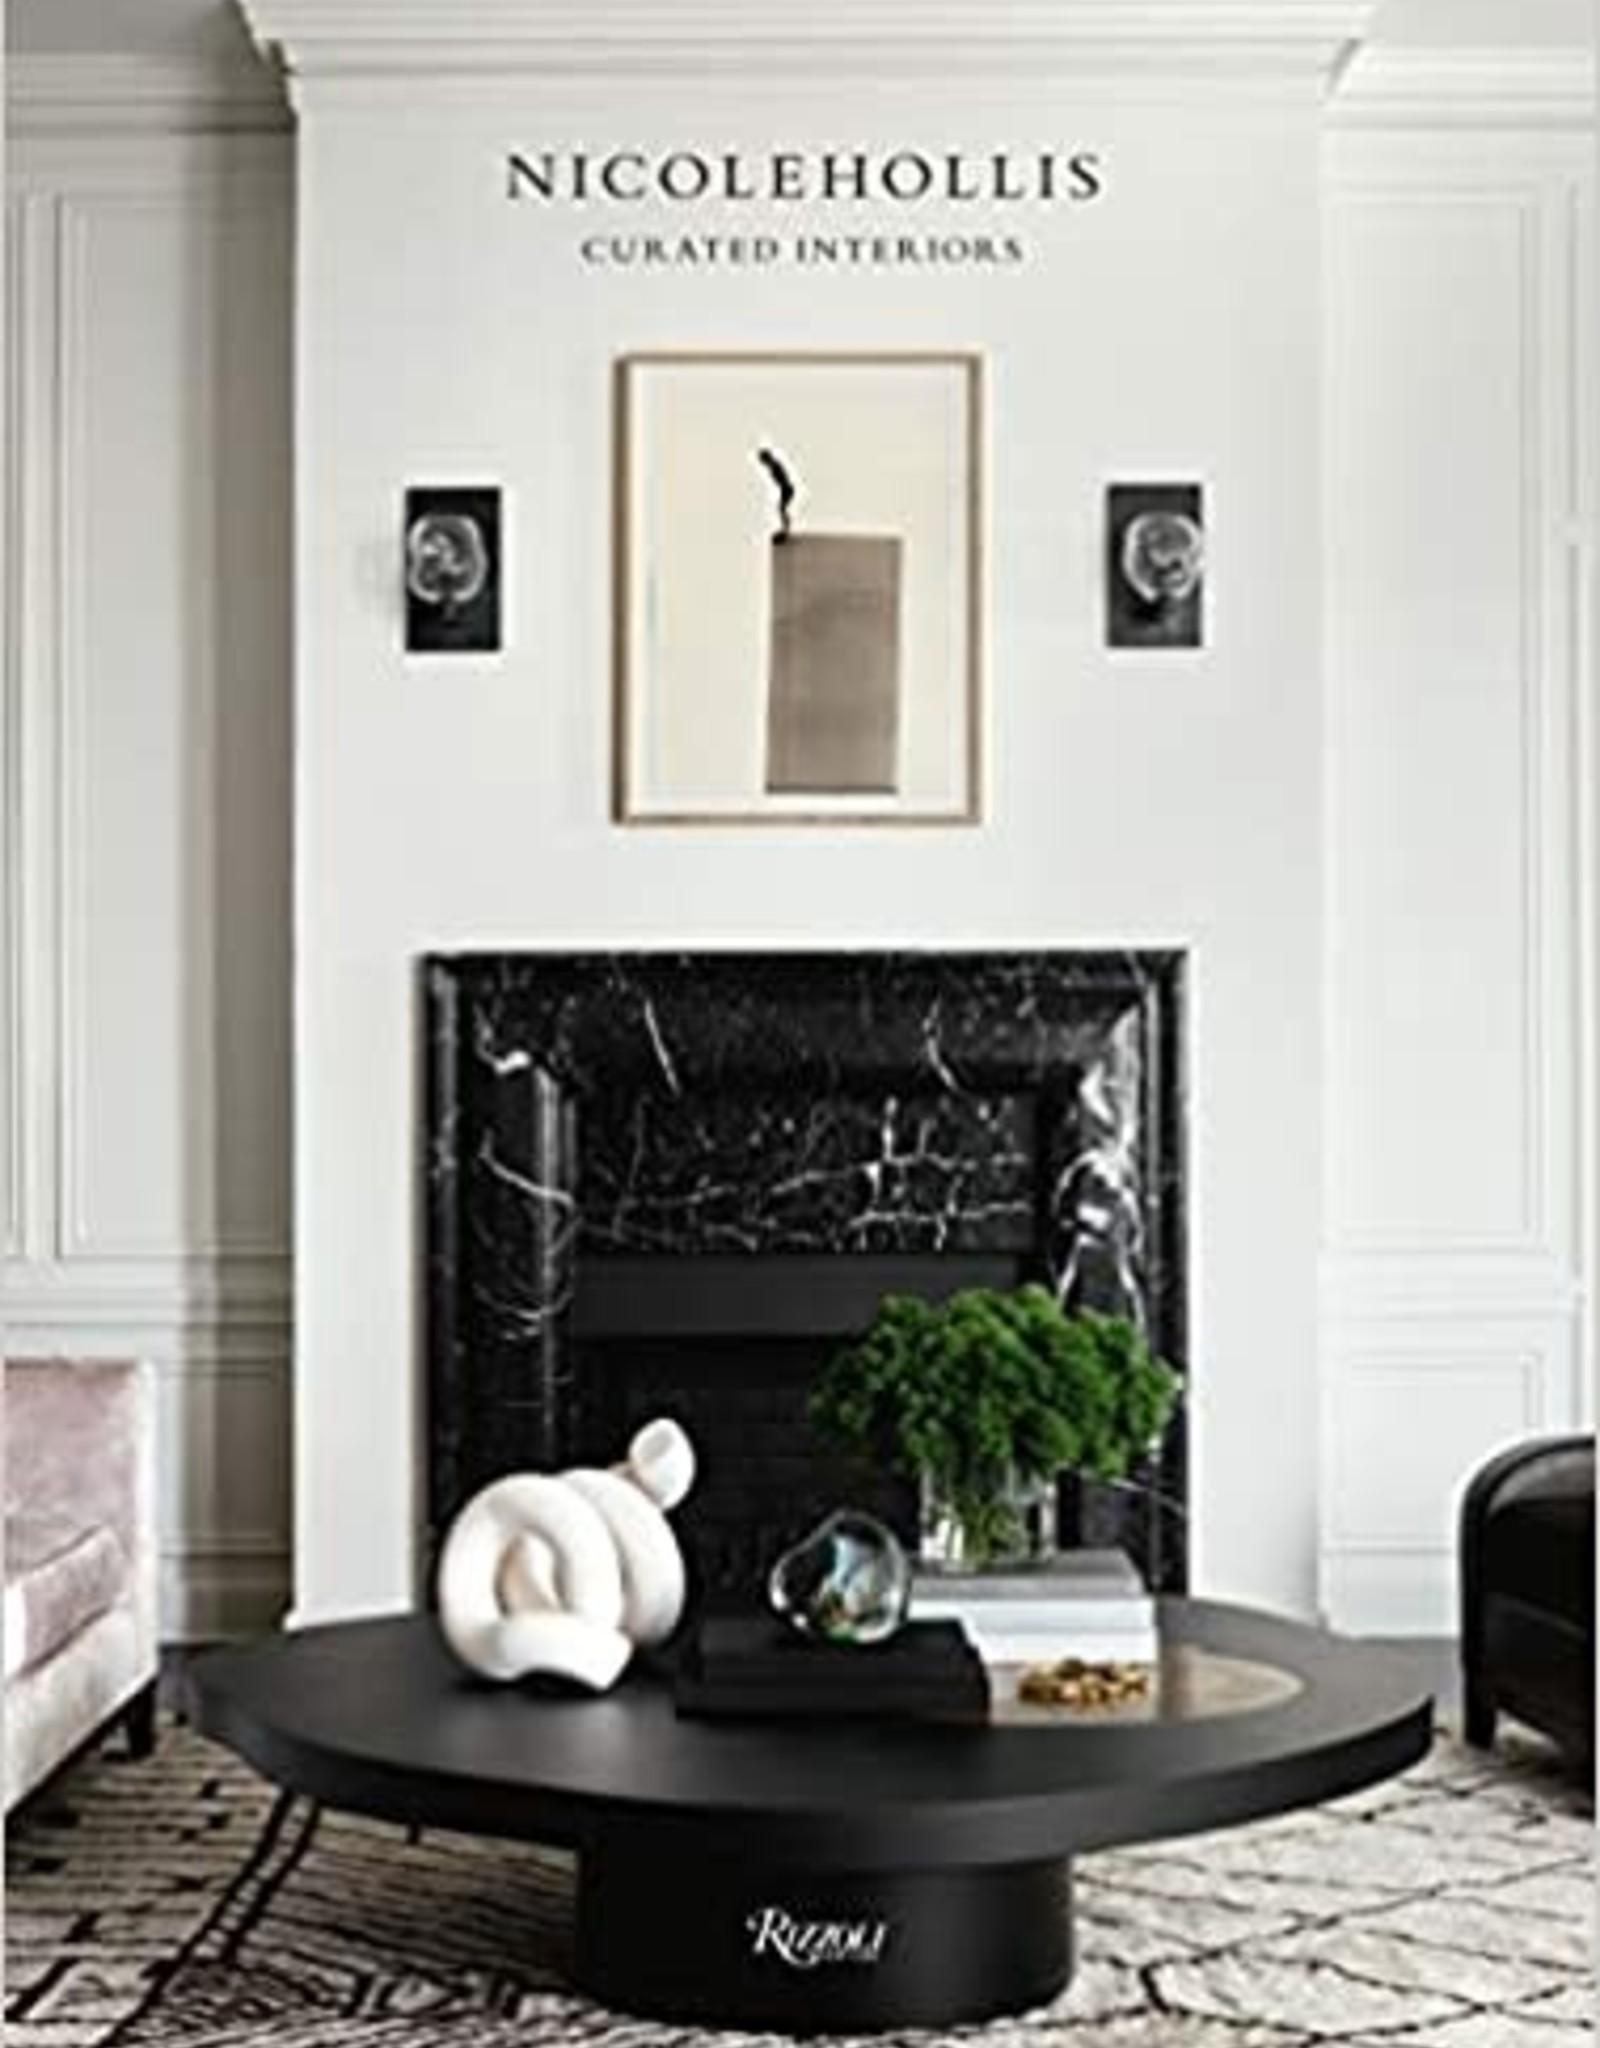 Nicole Hollis: Curated Interiors